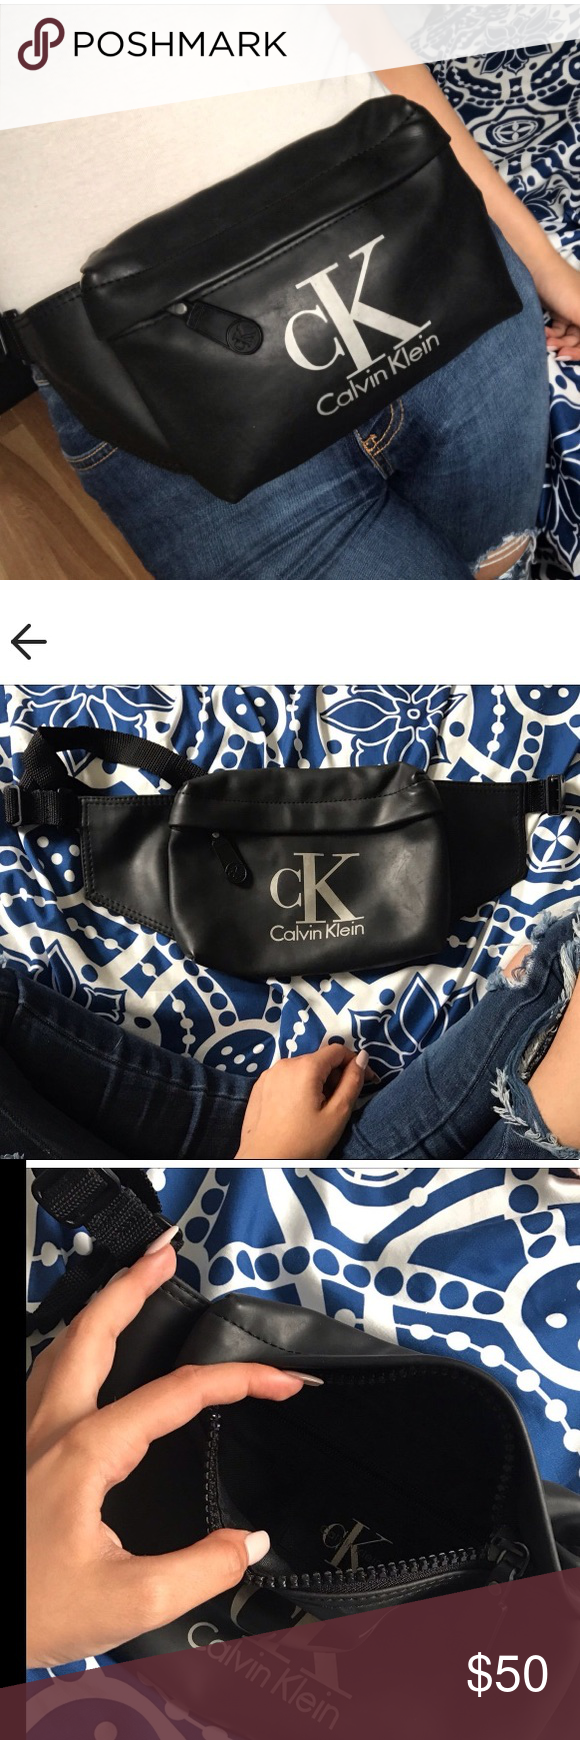 b53c600d8f95dc Vintage Calvin Klein fanny pack Super cute vtg Calvin Klein fanny pack  purchased on depop just